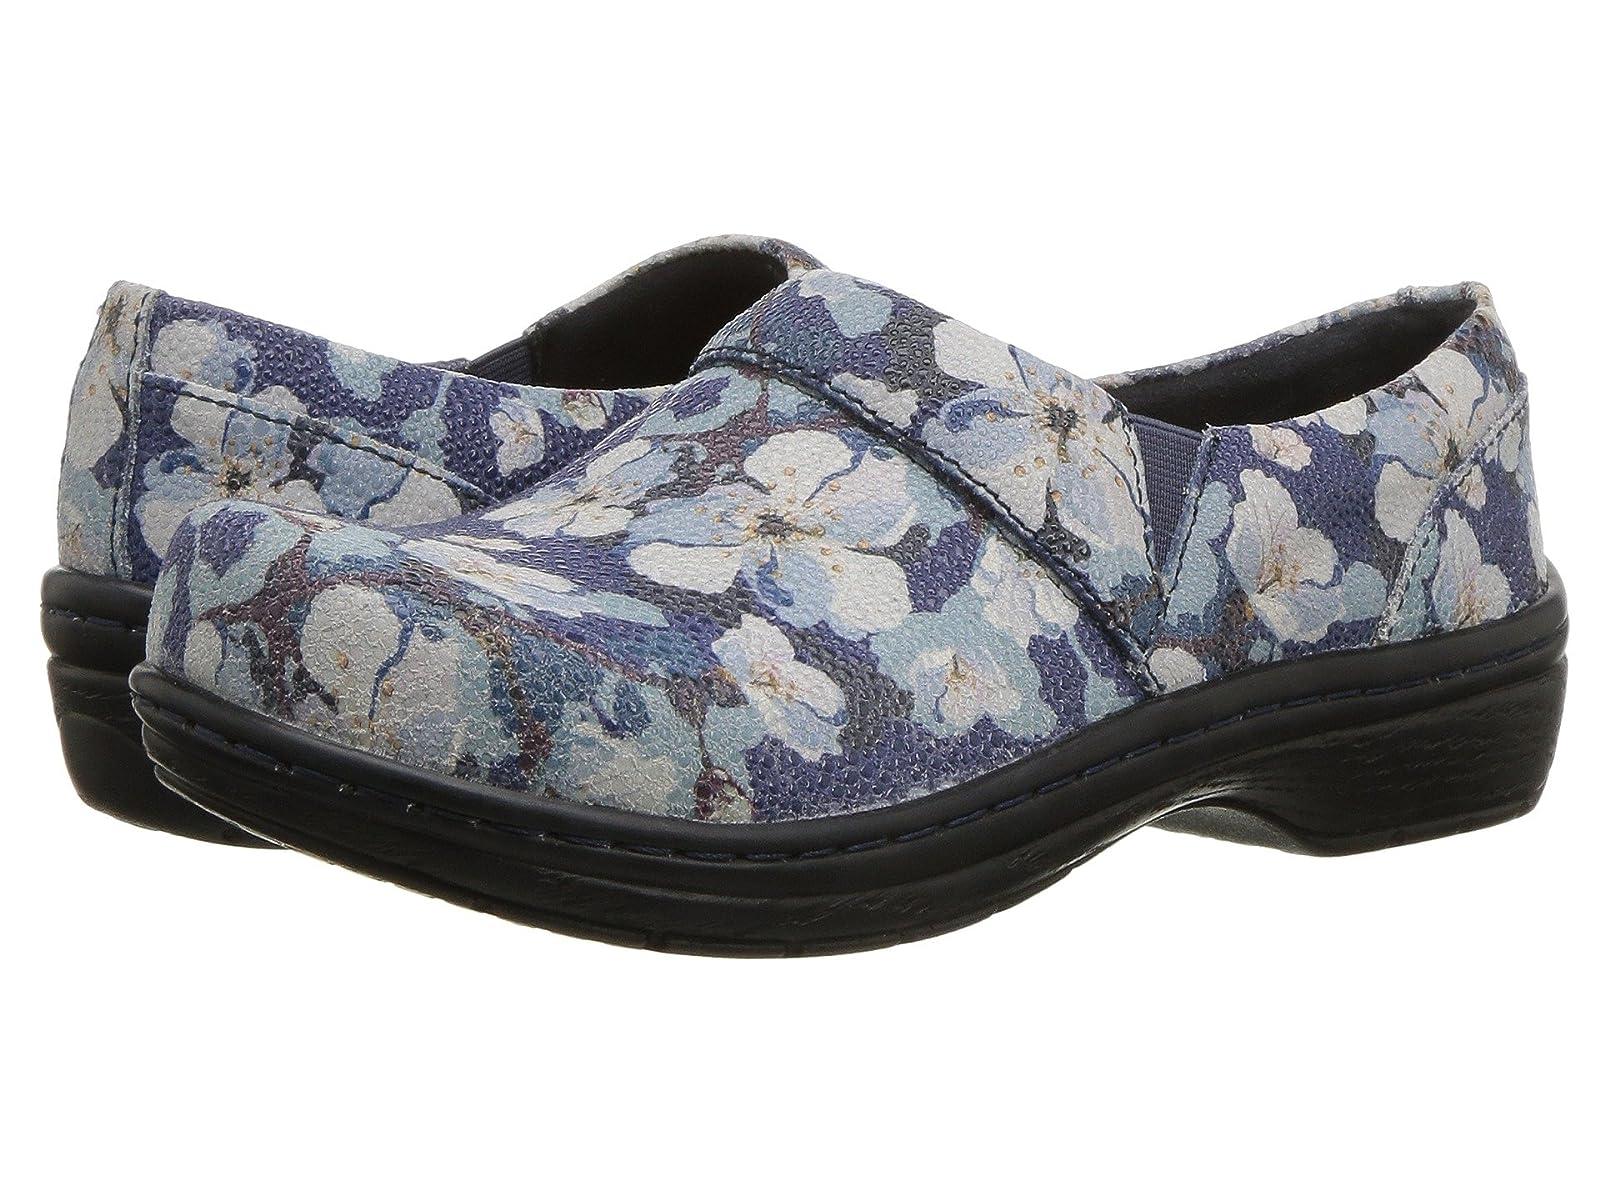 Klogs Footwear MissionAtmospheric grades have affordable shoes